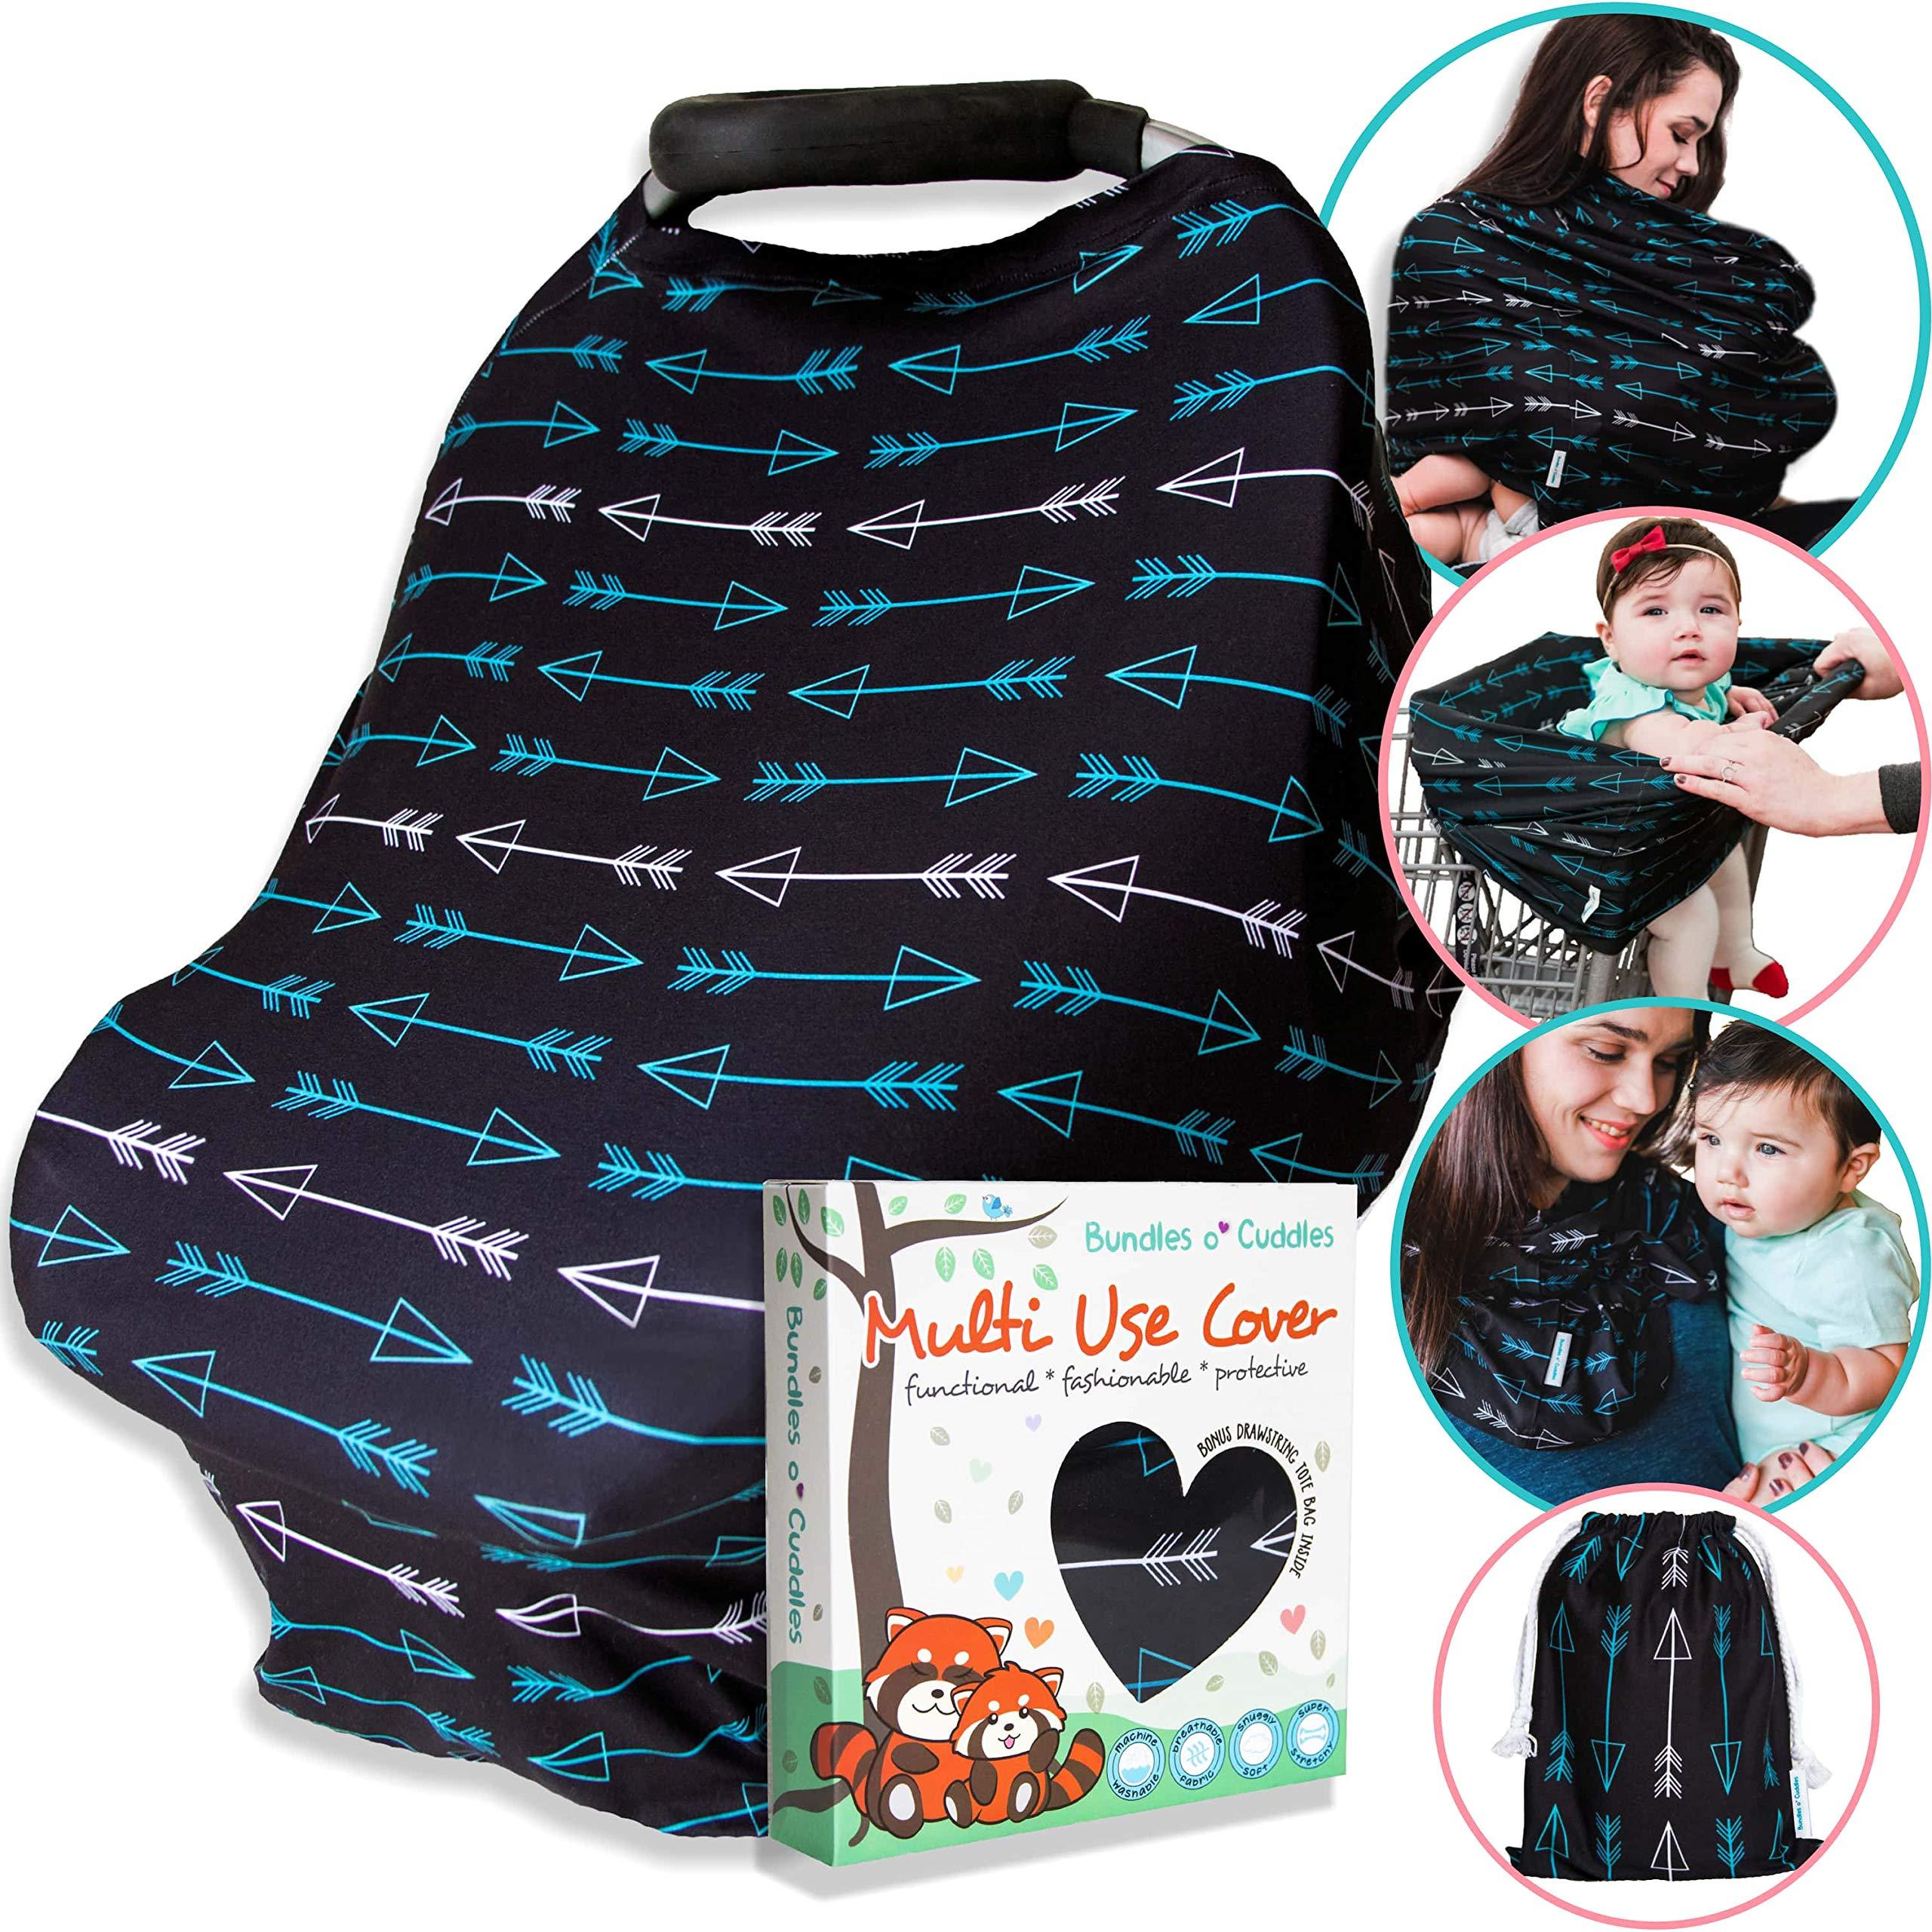 Cuddle Wrap Pattern Free Patterns